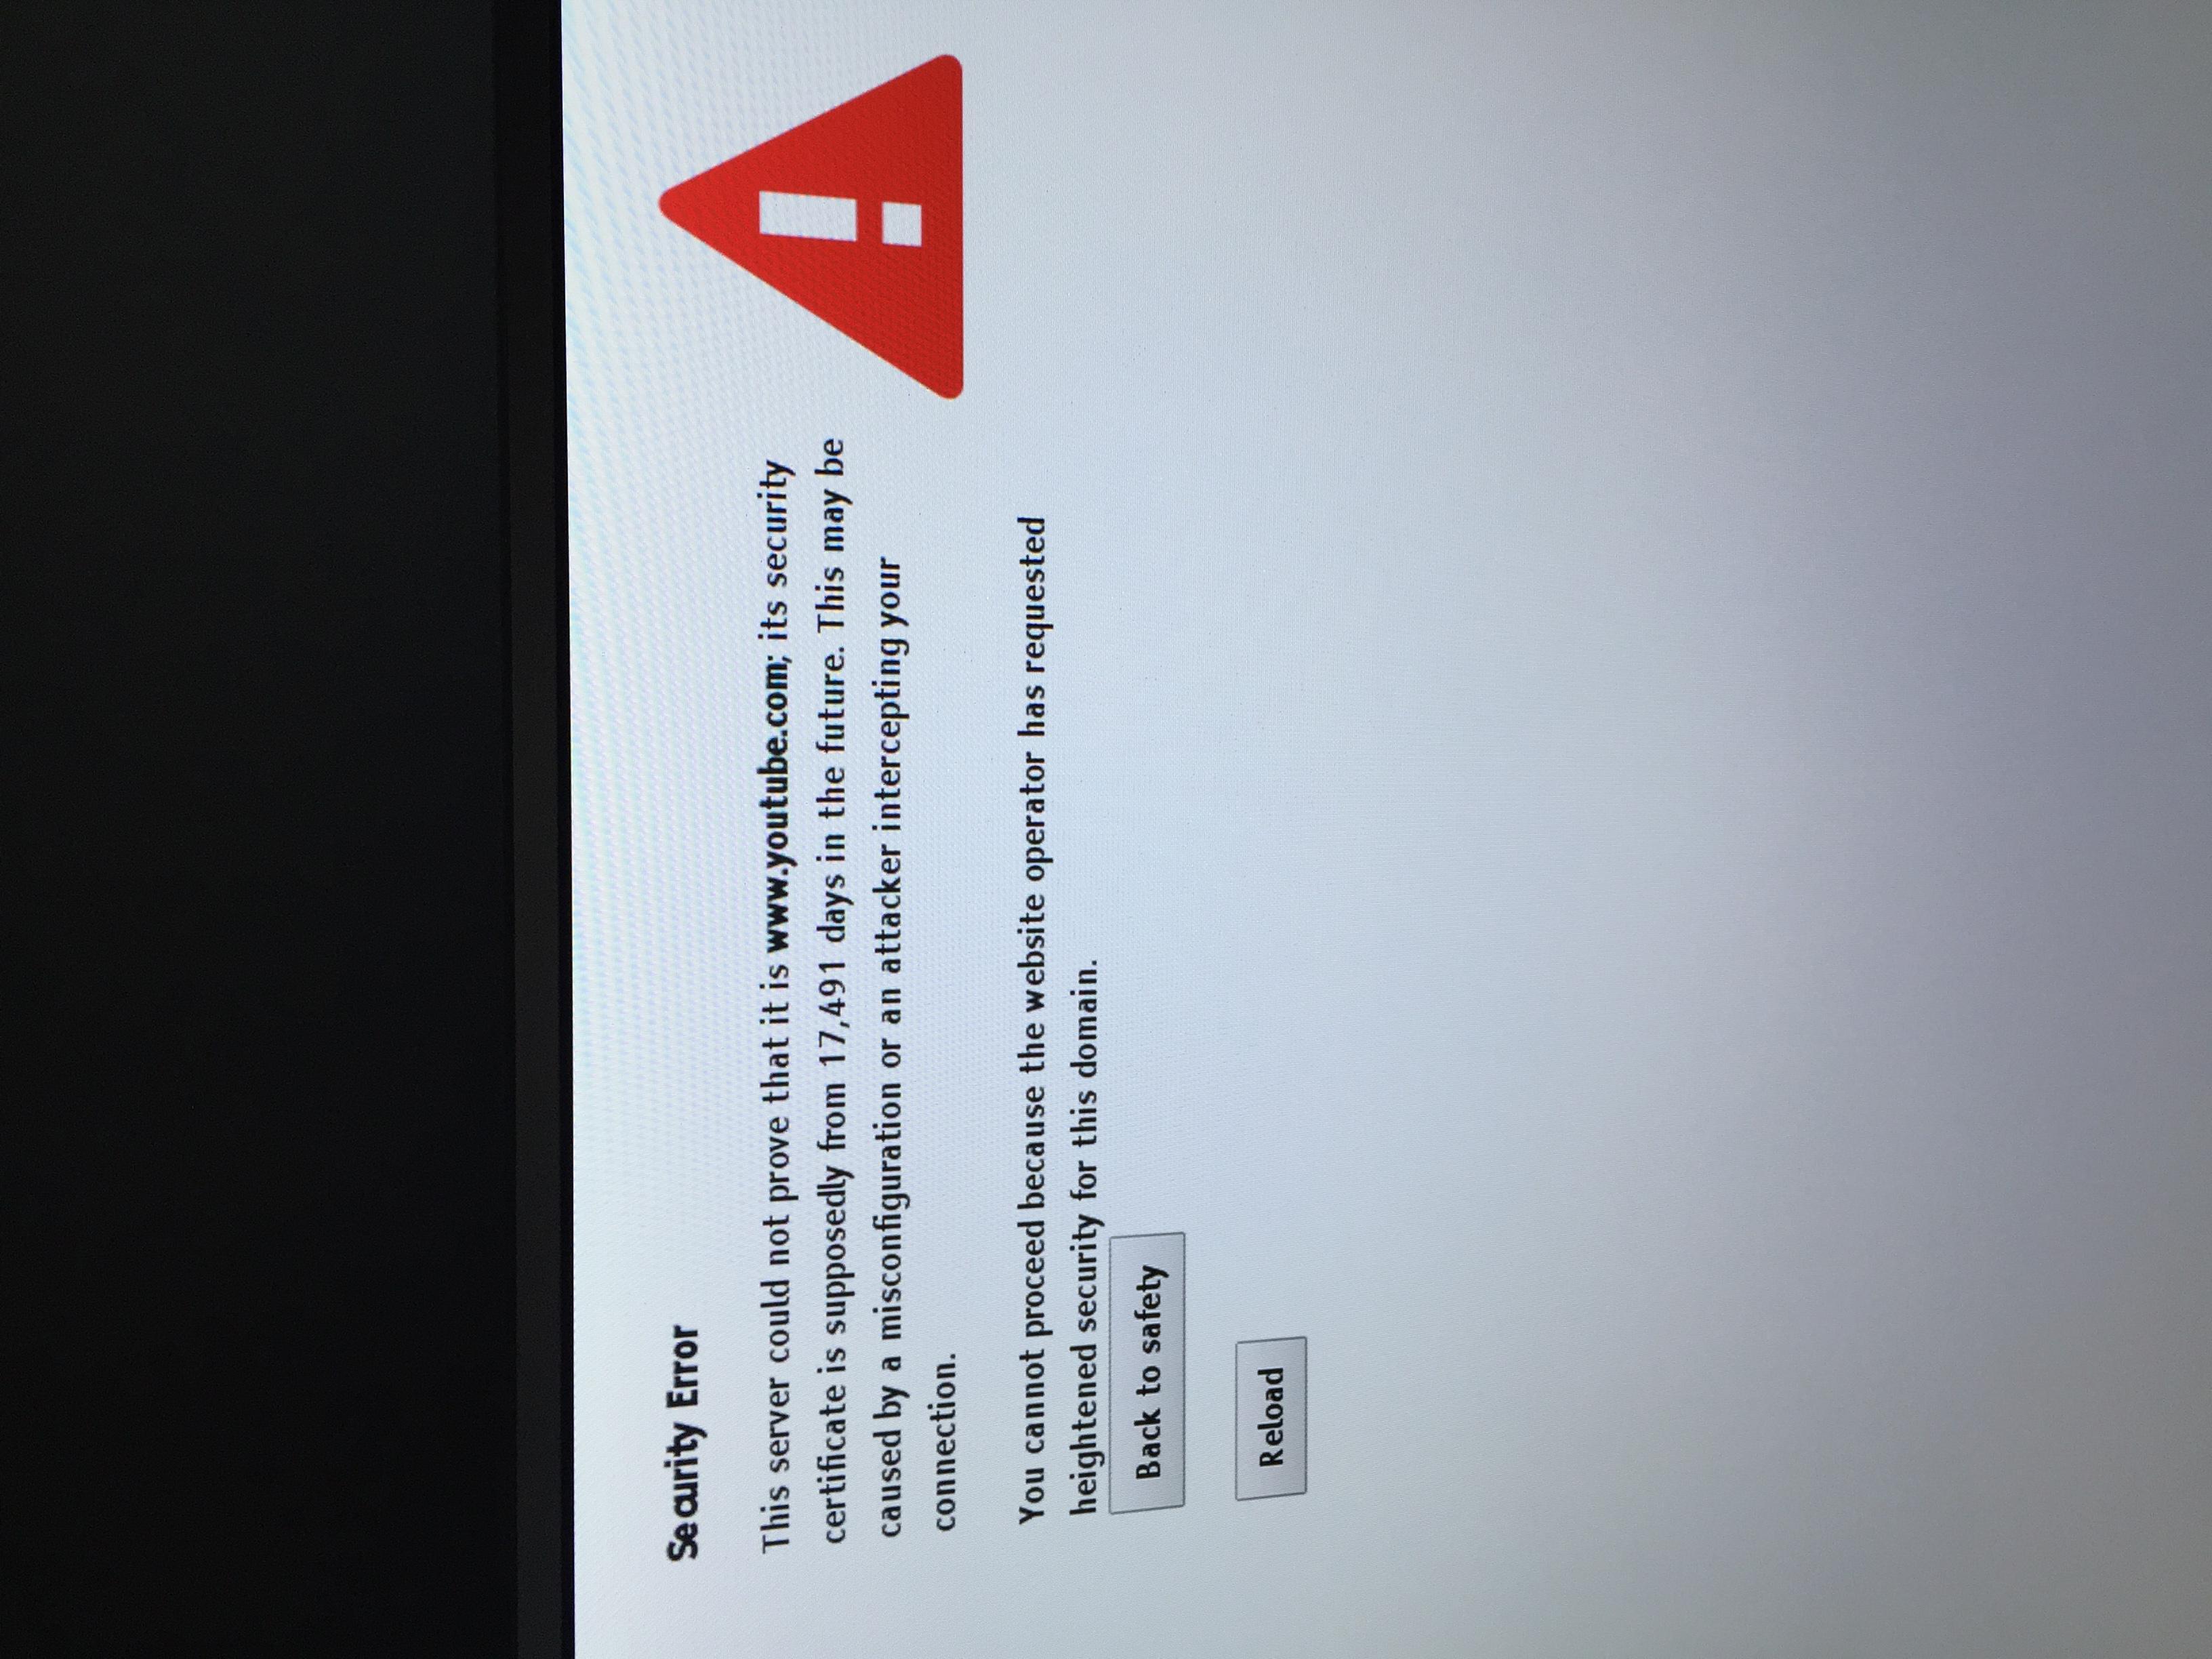 Youtube Security Error Message - YouTube Help